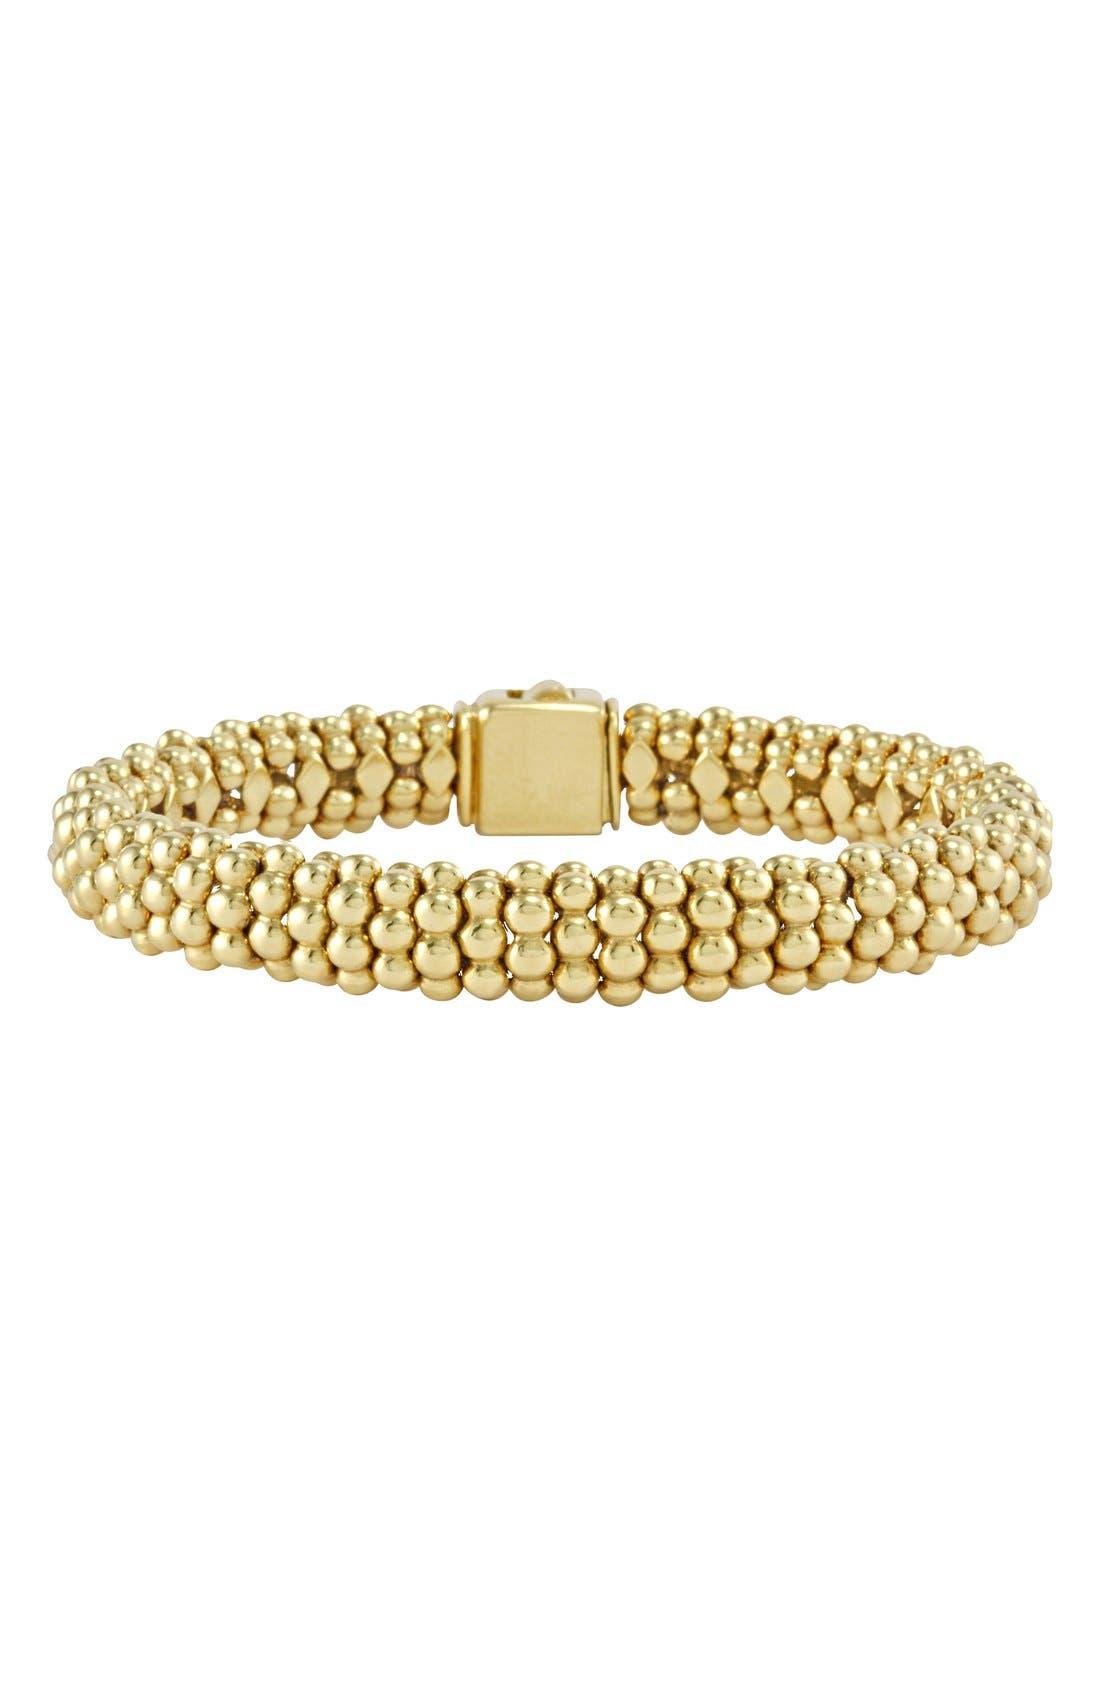 'Caviar Gold' Rope Bracelet,                         Main,                         color, GOLD